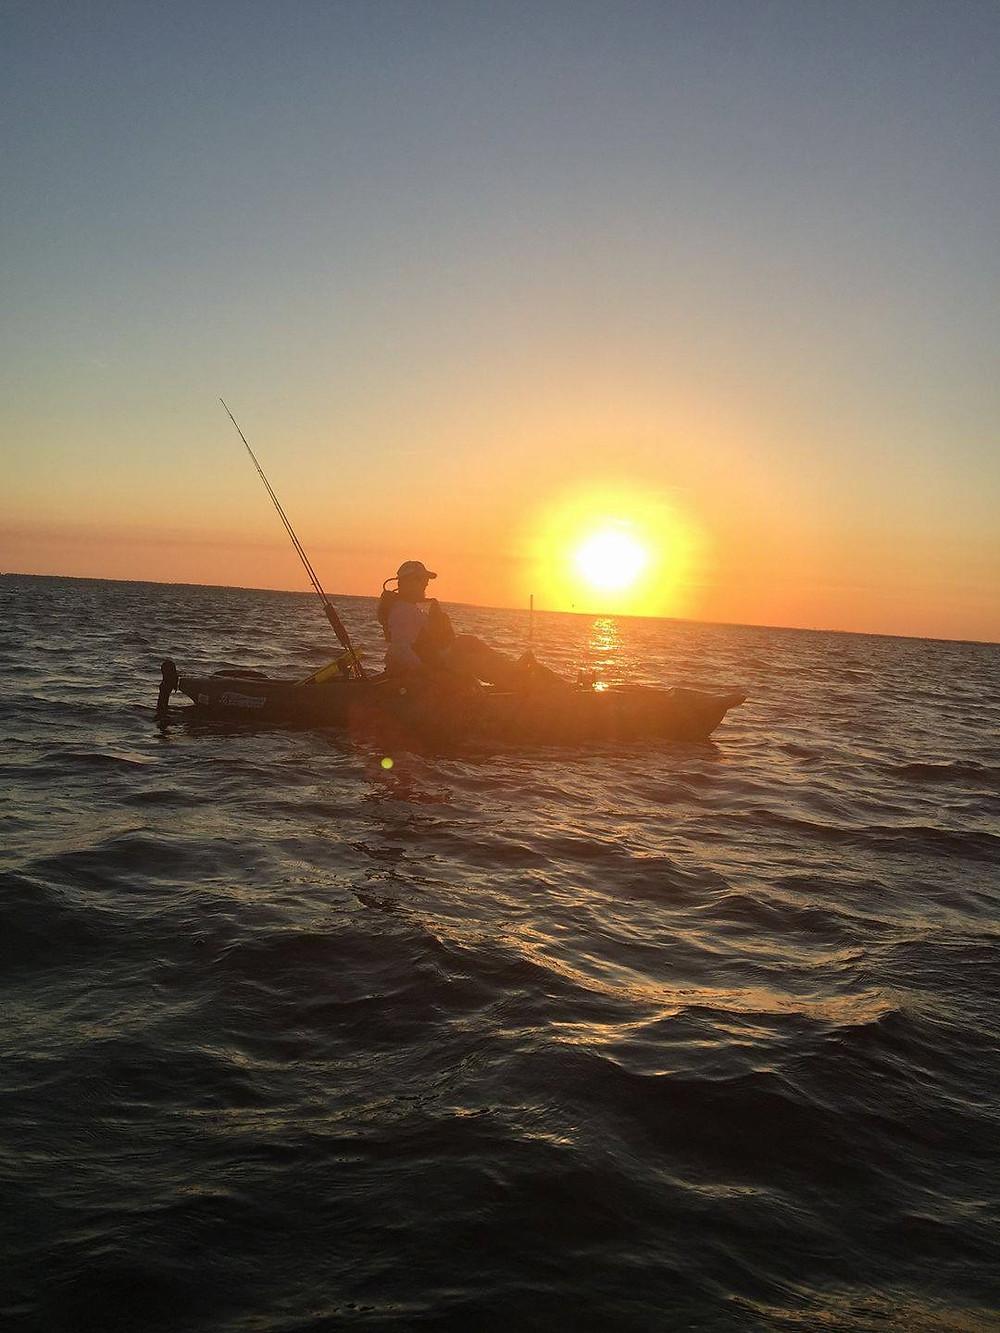 Kayak Bass Angler and River Town Outiftters manager Faron Davidson